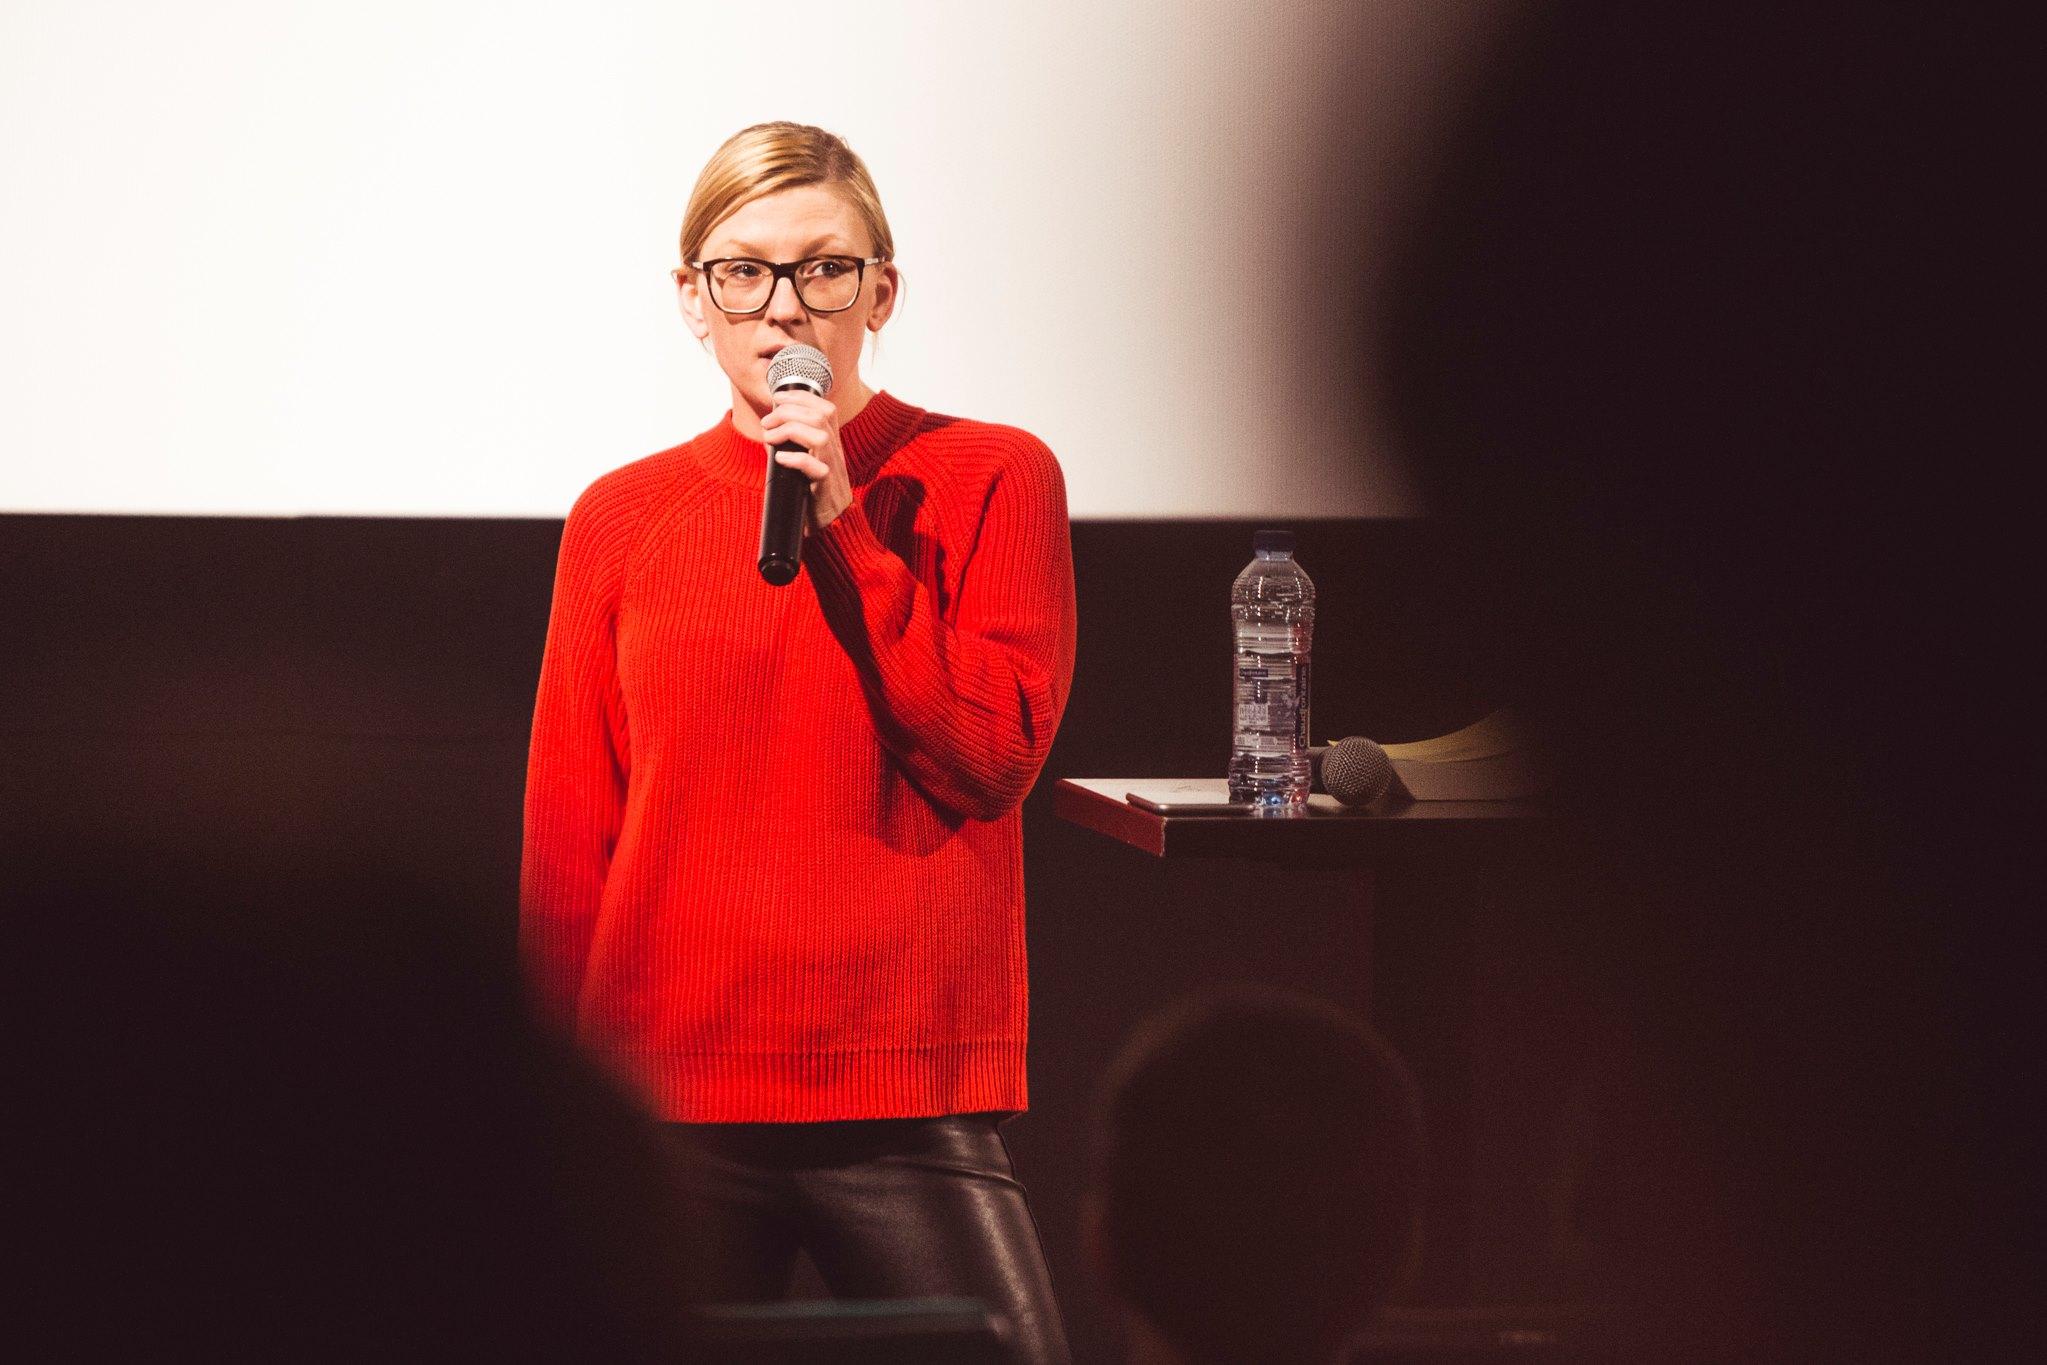 Kotryna Lingienė introduces the talk in Vilnius. Photo by Tautvydas Stukas..jpg